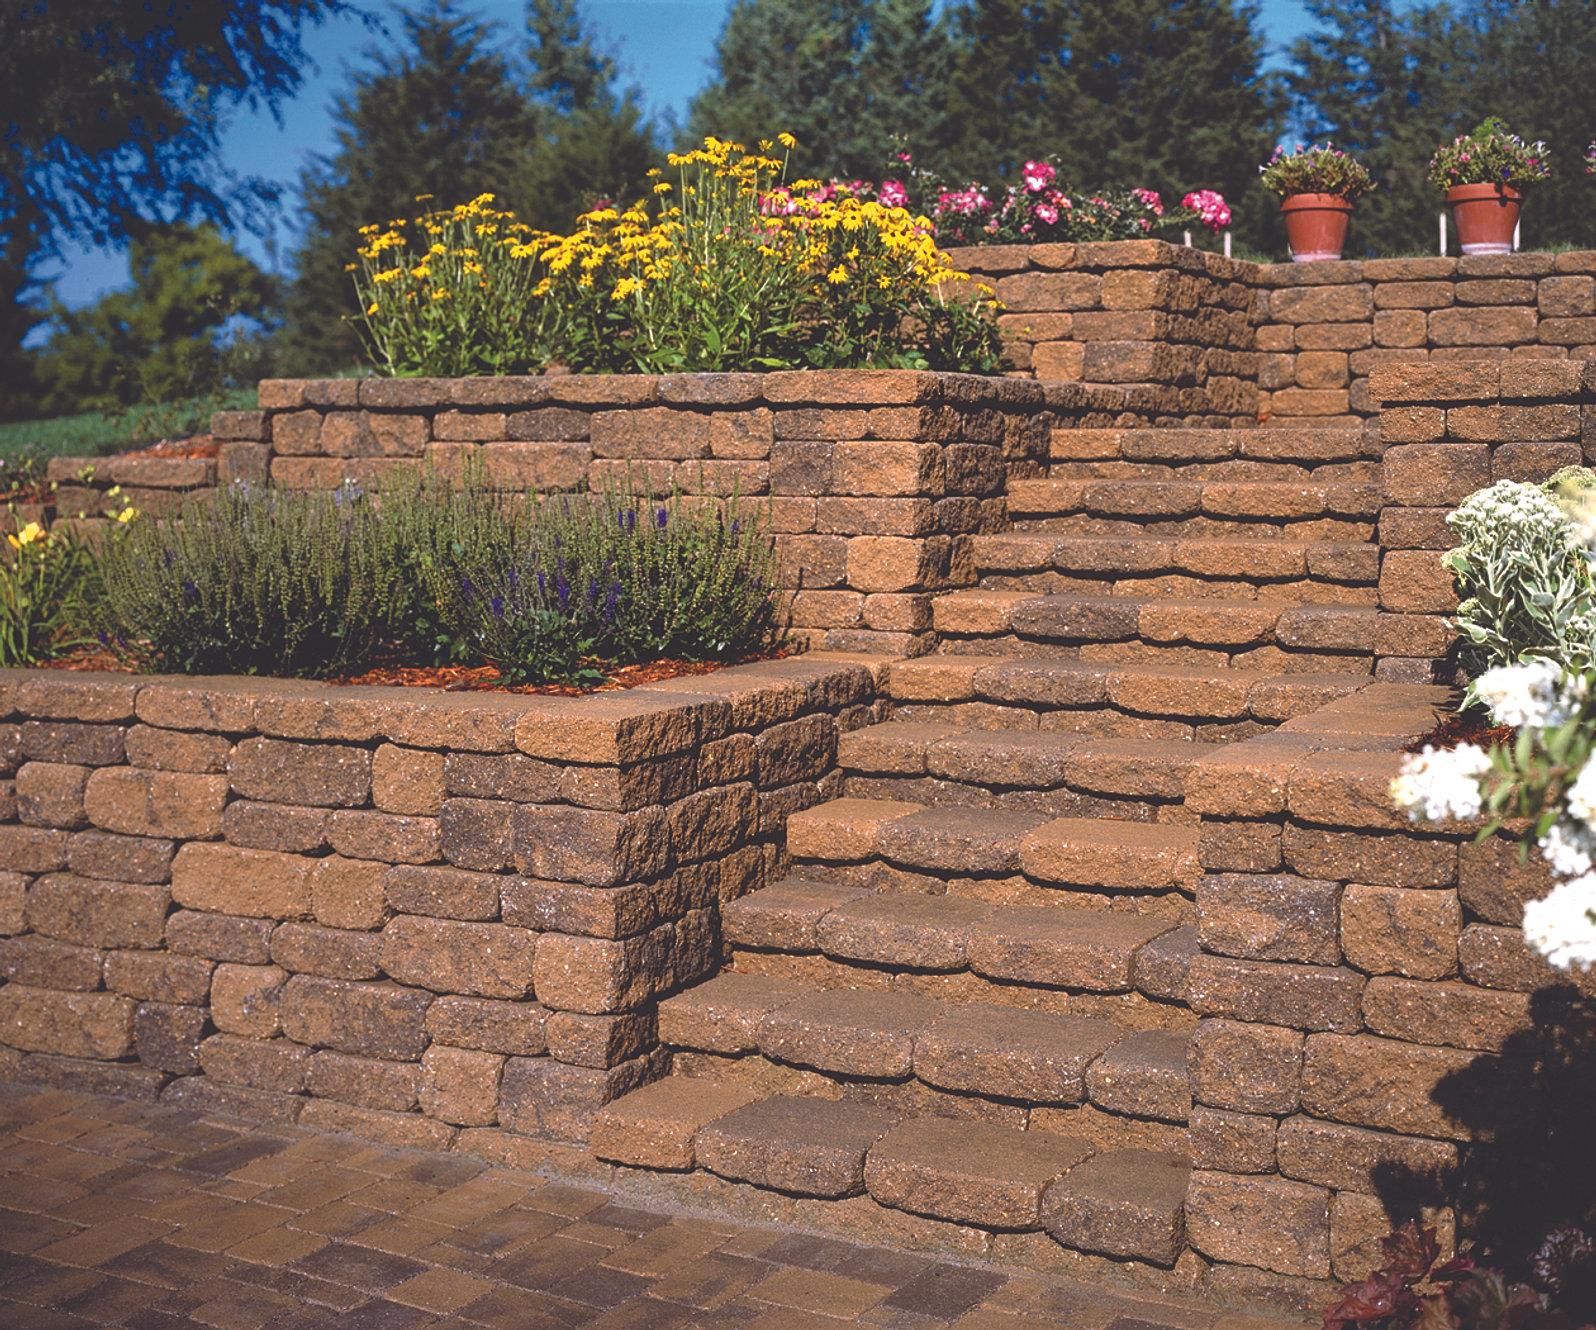 100 landscaping stones albany ny aztlan outdoor living tale